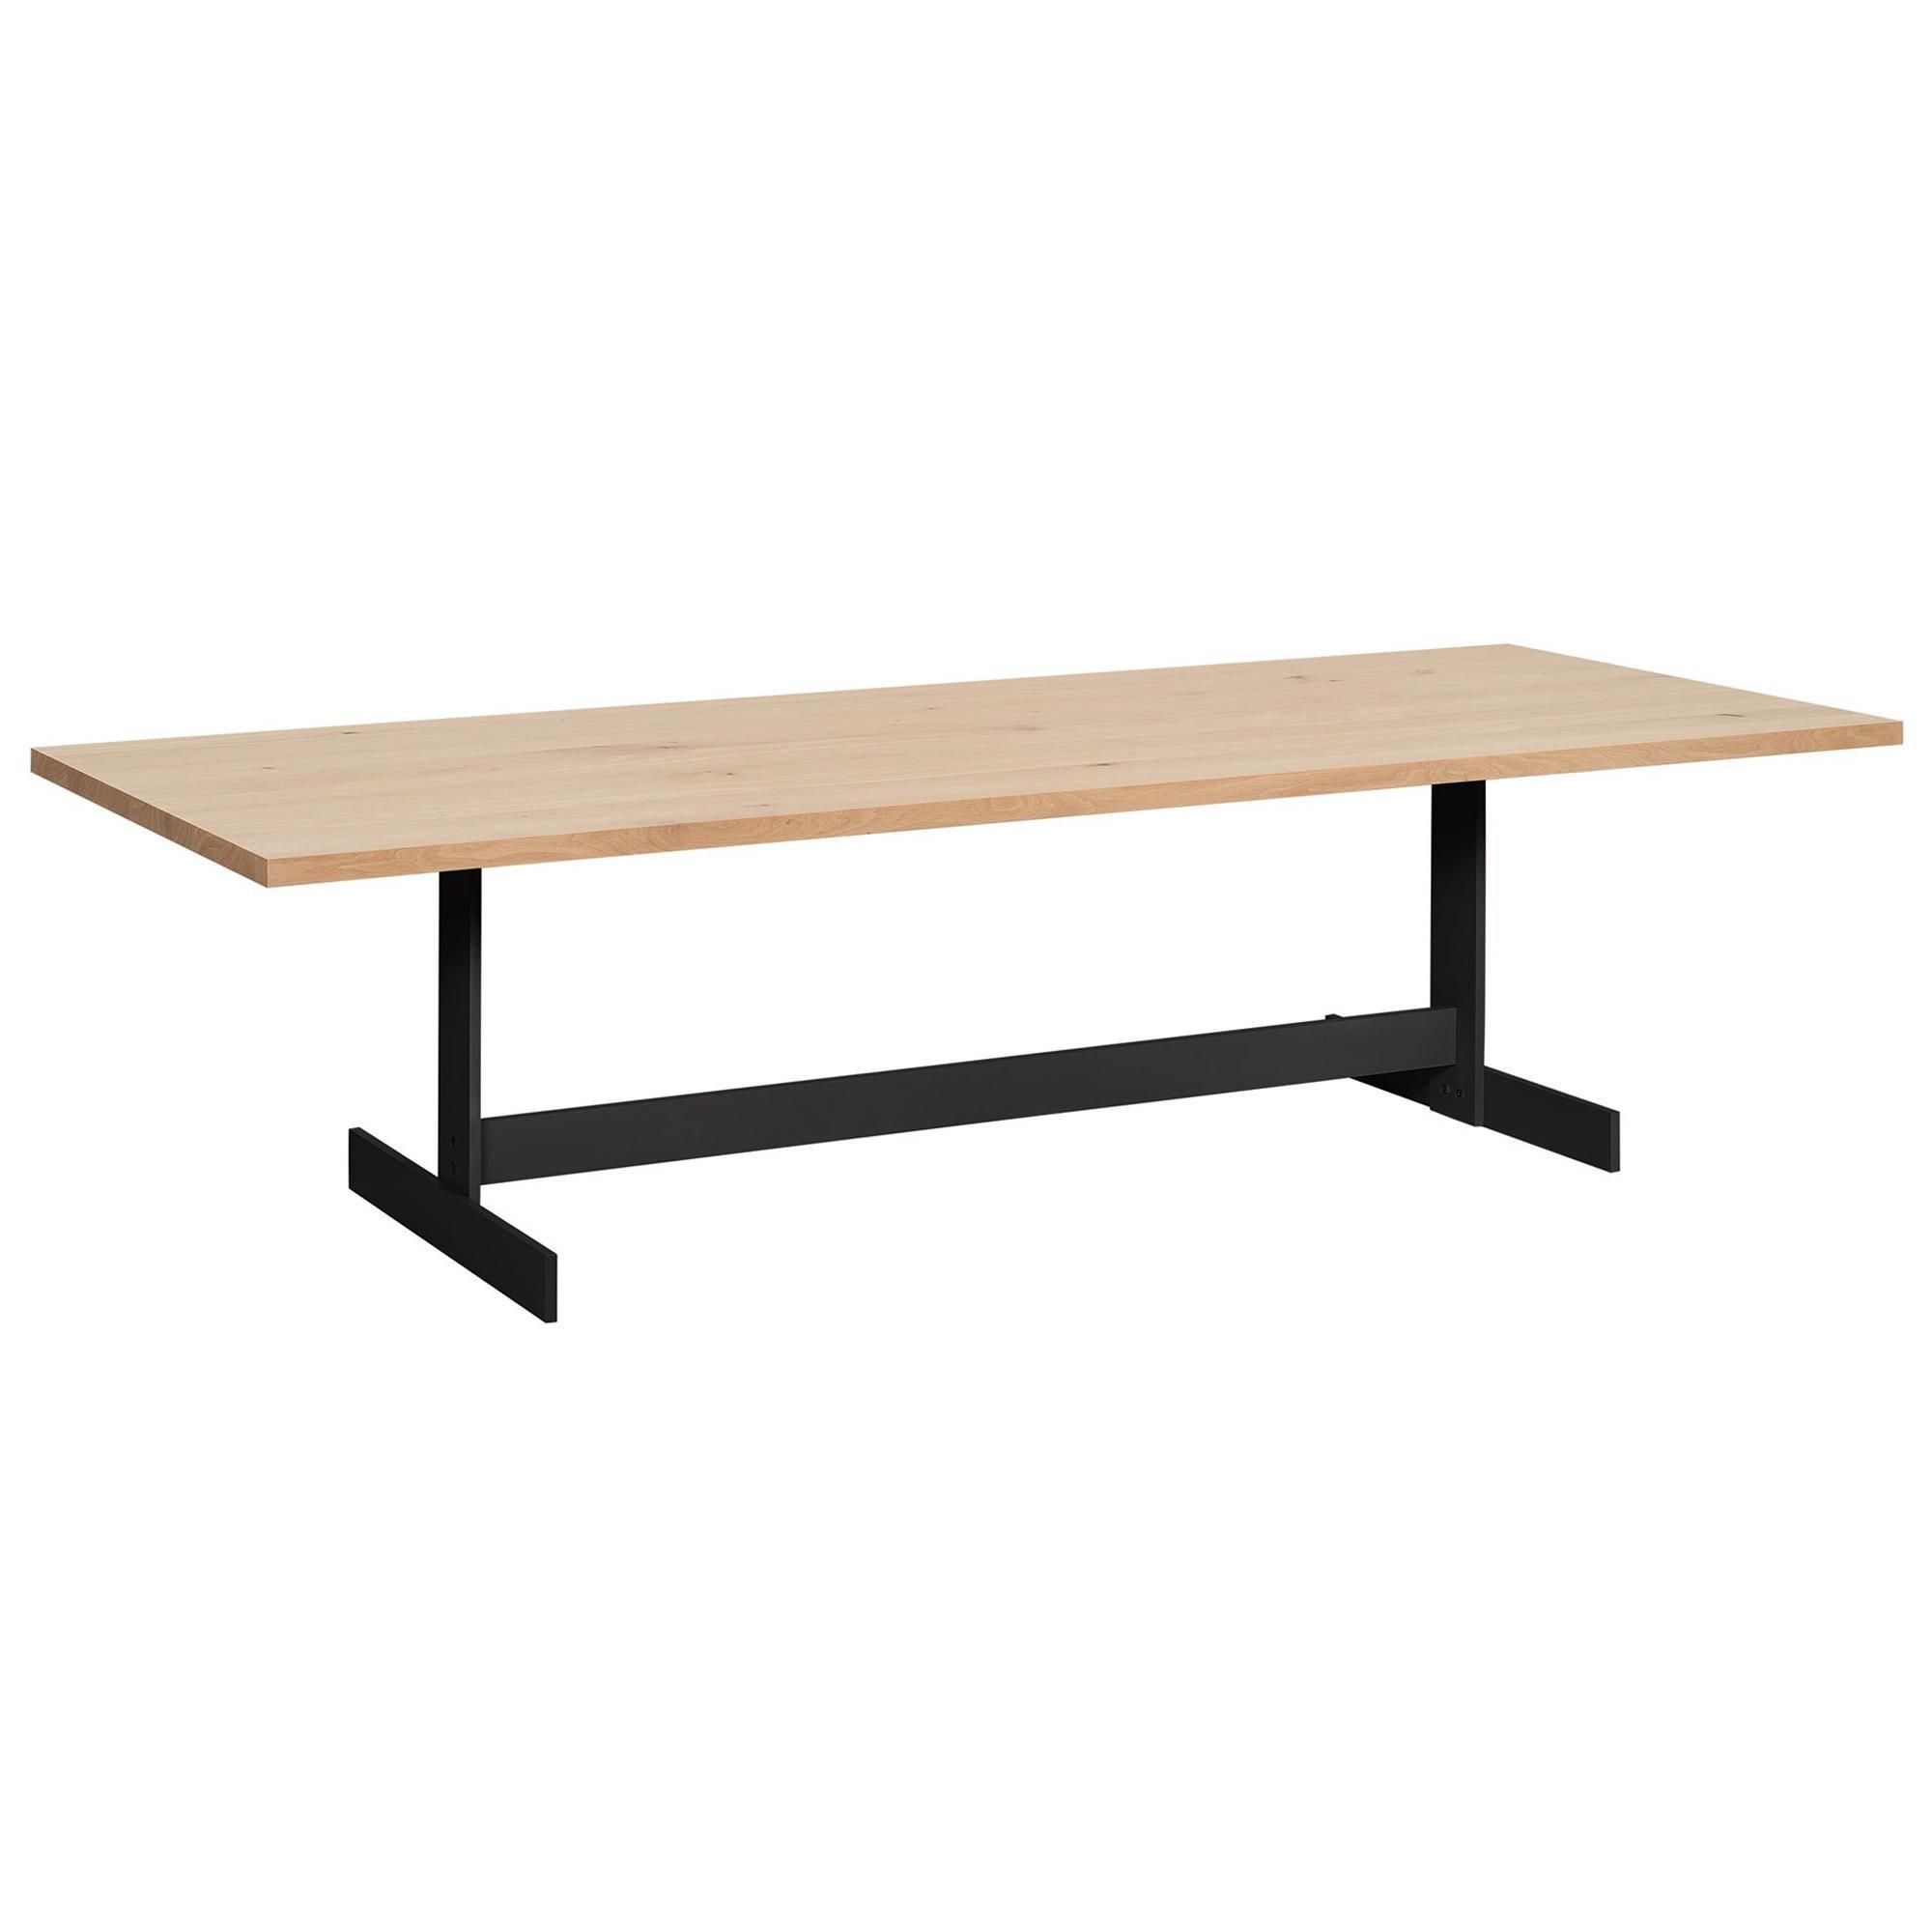 e15 Kazimir Table with Jet Black Base by Philipp Mainzer